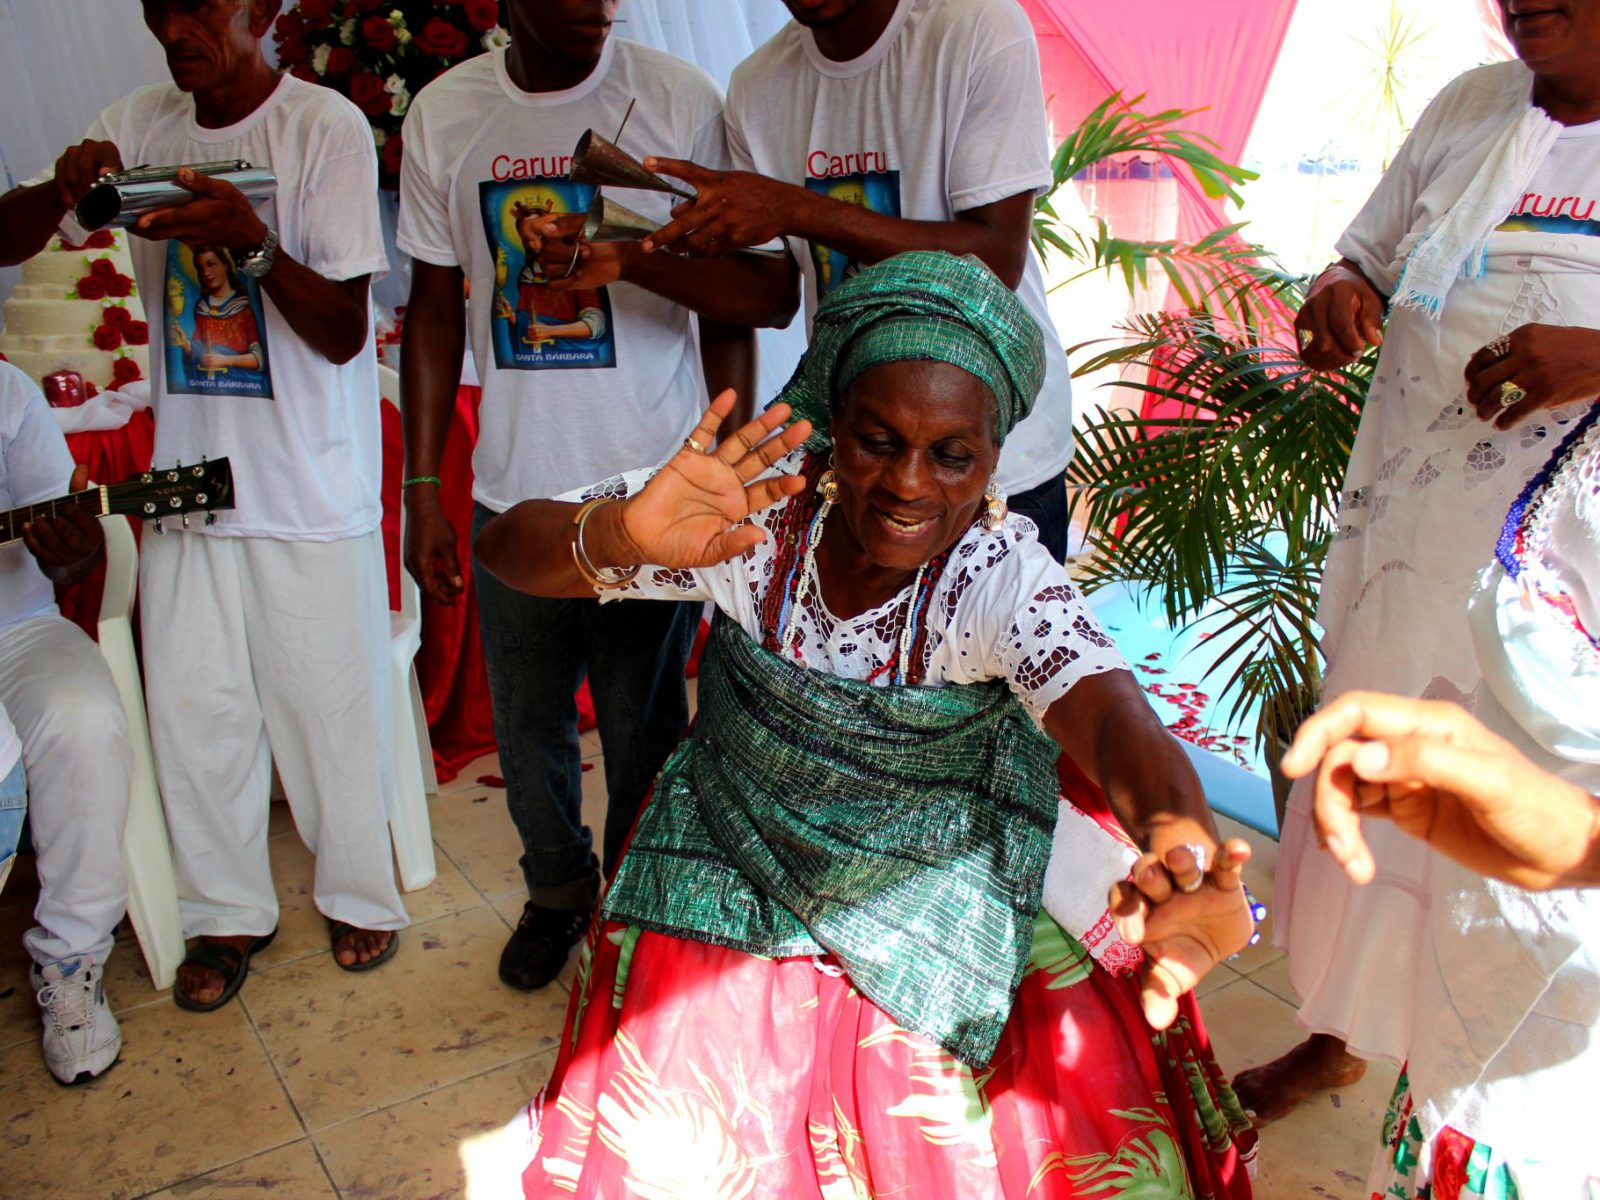 Dona Edinha e grupo Nicinha do Samba e Raízes de Santo Amaro. Arembepe-BA, Dezembro de 2014. ©Nina Graeff